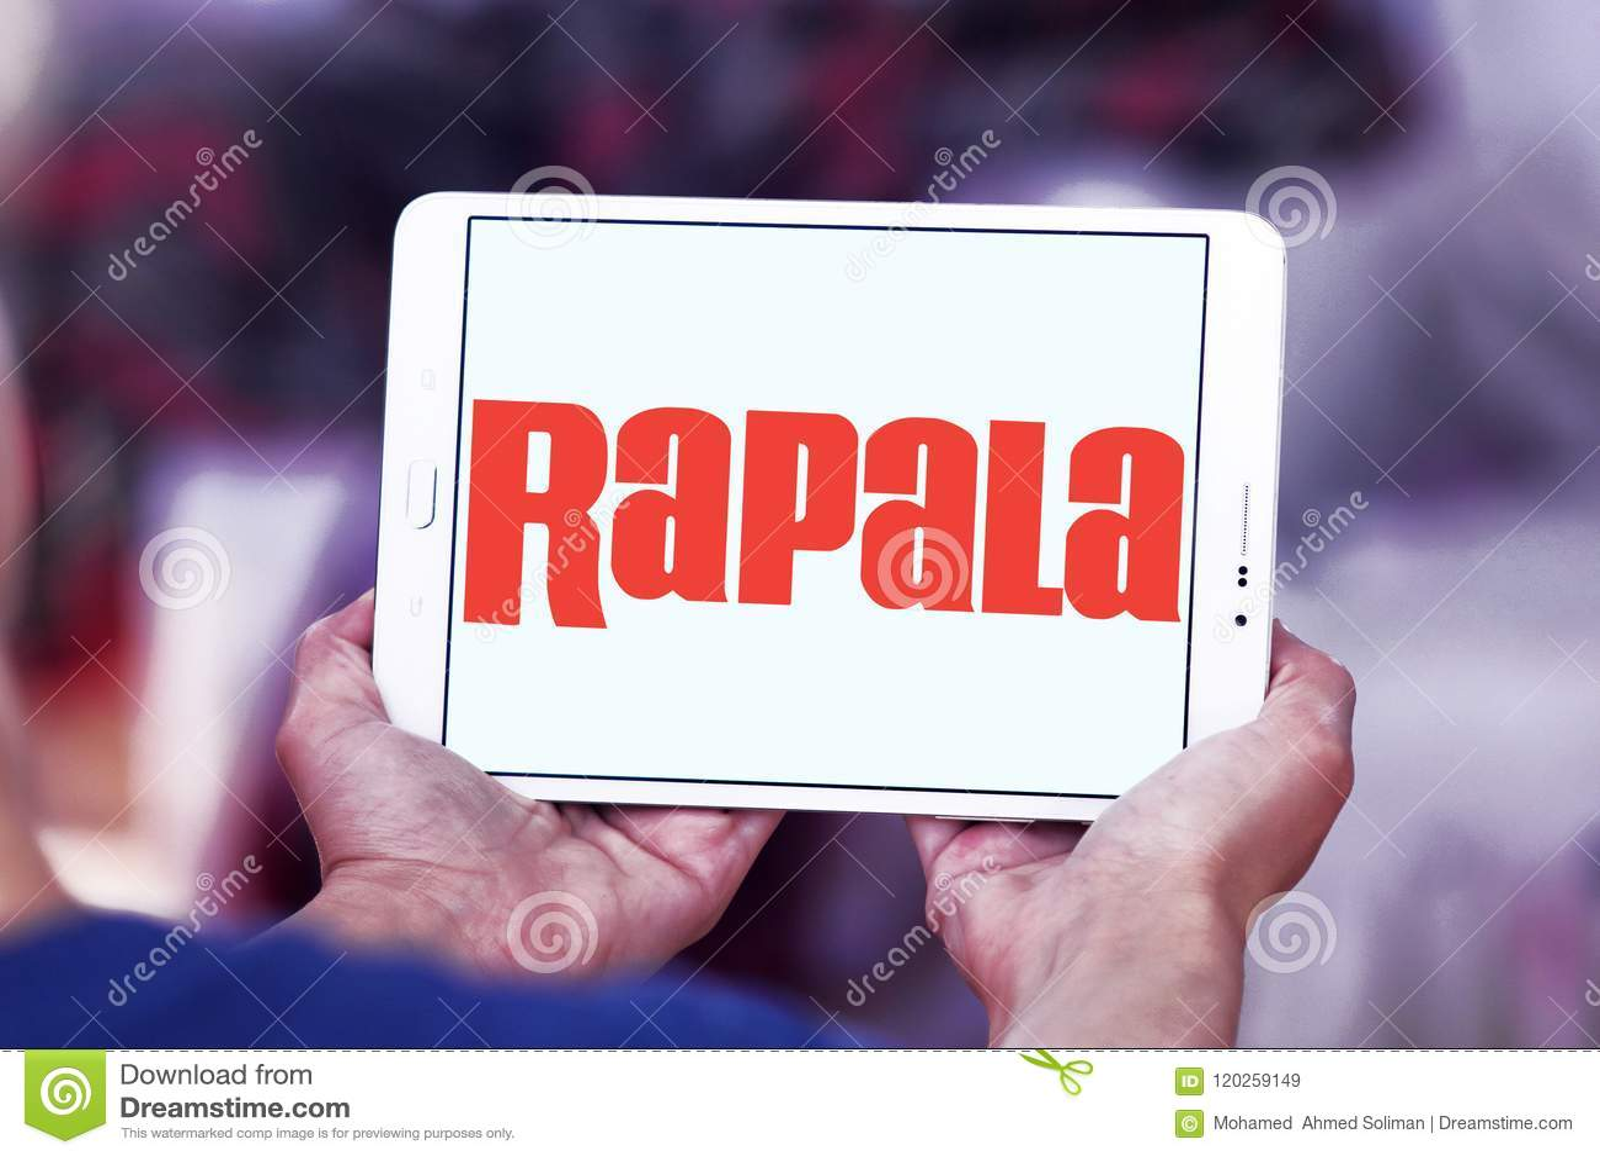 Rapala company logo editorial stock image  Image of symbol - 120259149